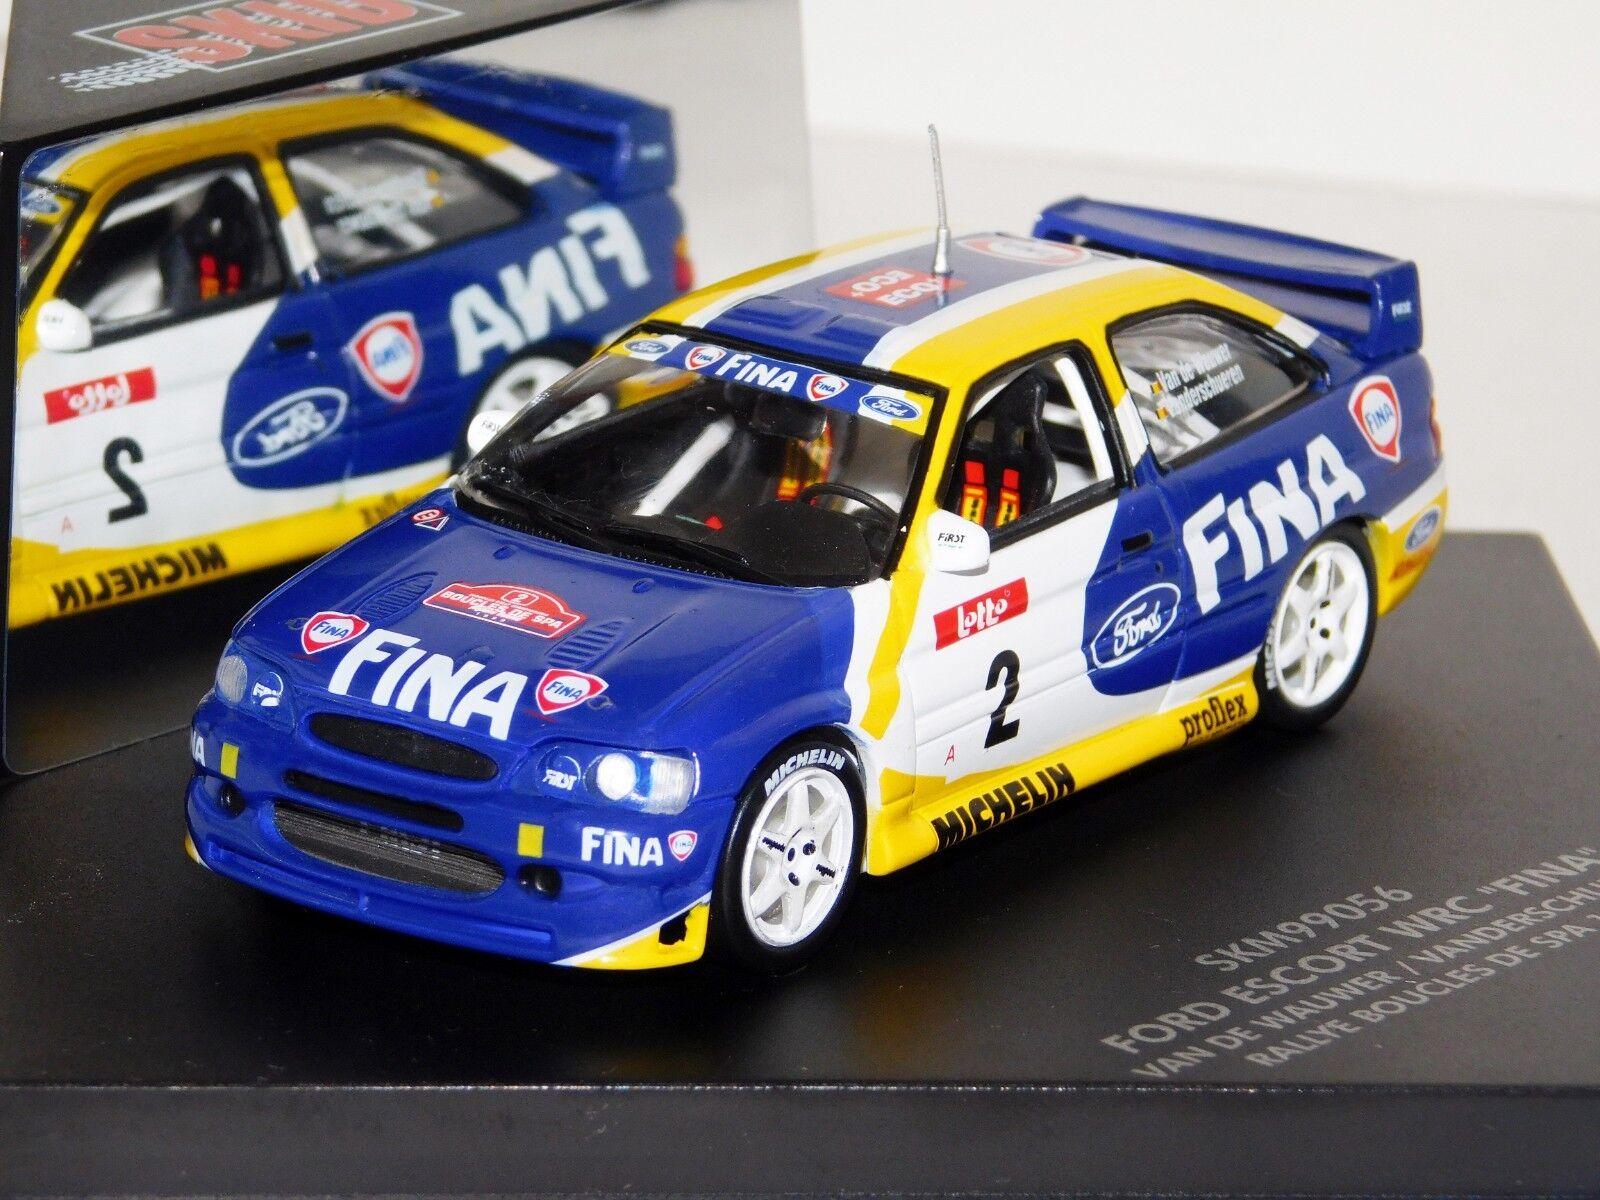 FORD ESCORT WRC FINA  2 VAN DE WAUWER RALLY BOUCLES SPA 1999 SKID SKM99056 1 43